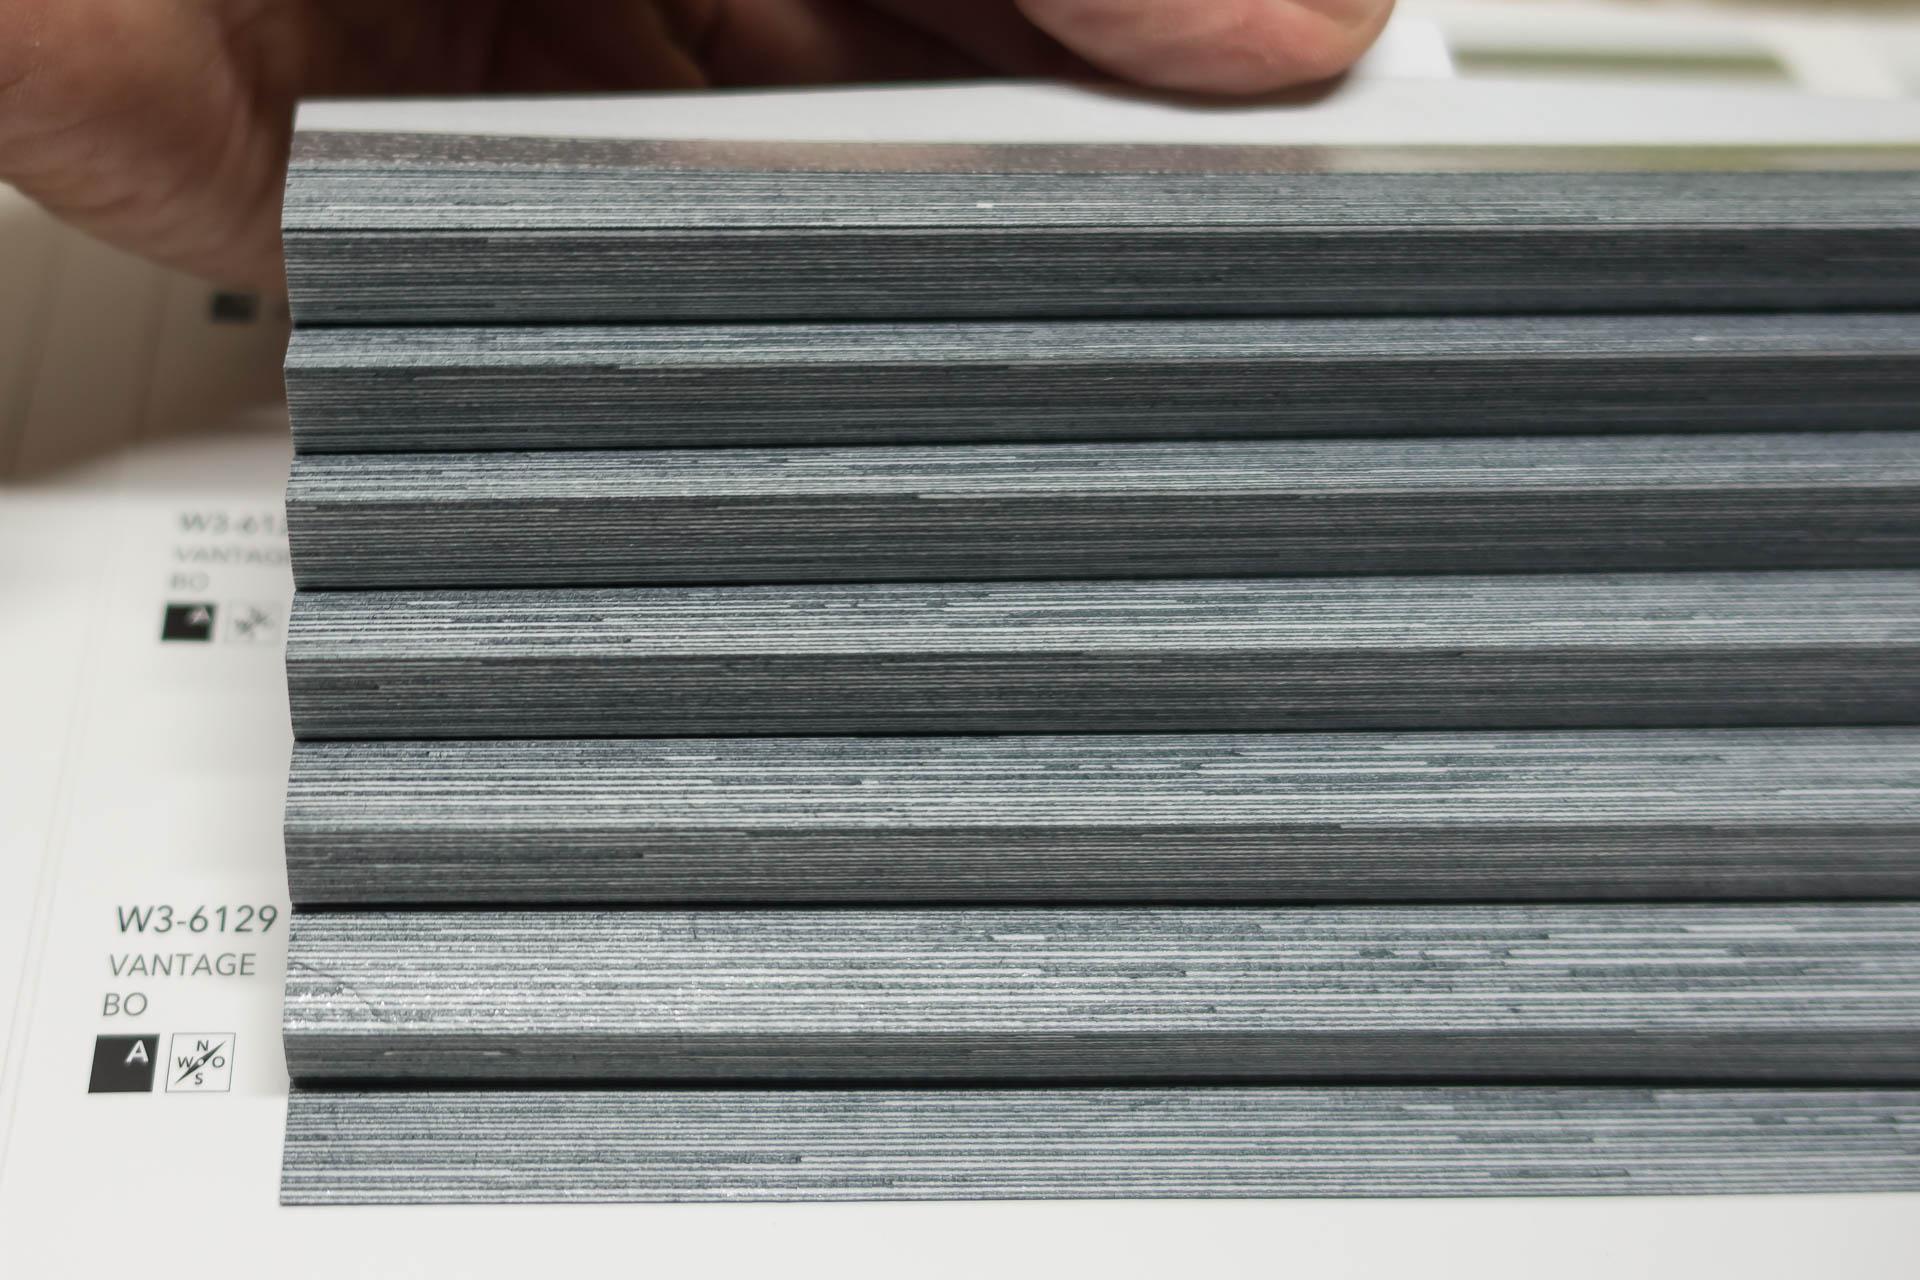 "Waben-Plissee-Stoff aus der Farbkarte ""Vantage BO"" | Material: 100 % PES"